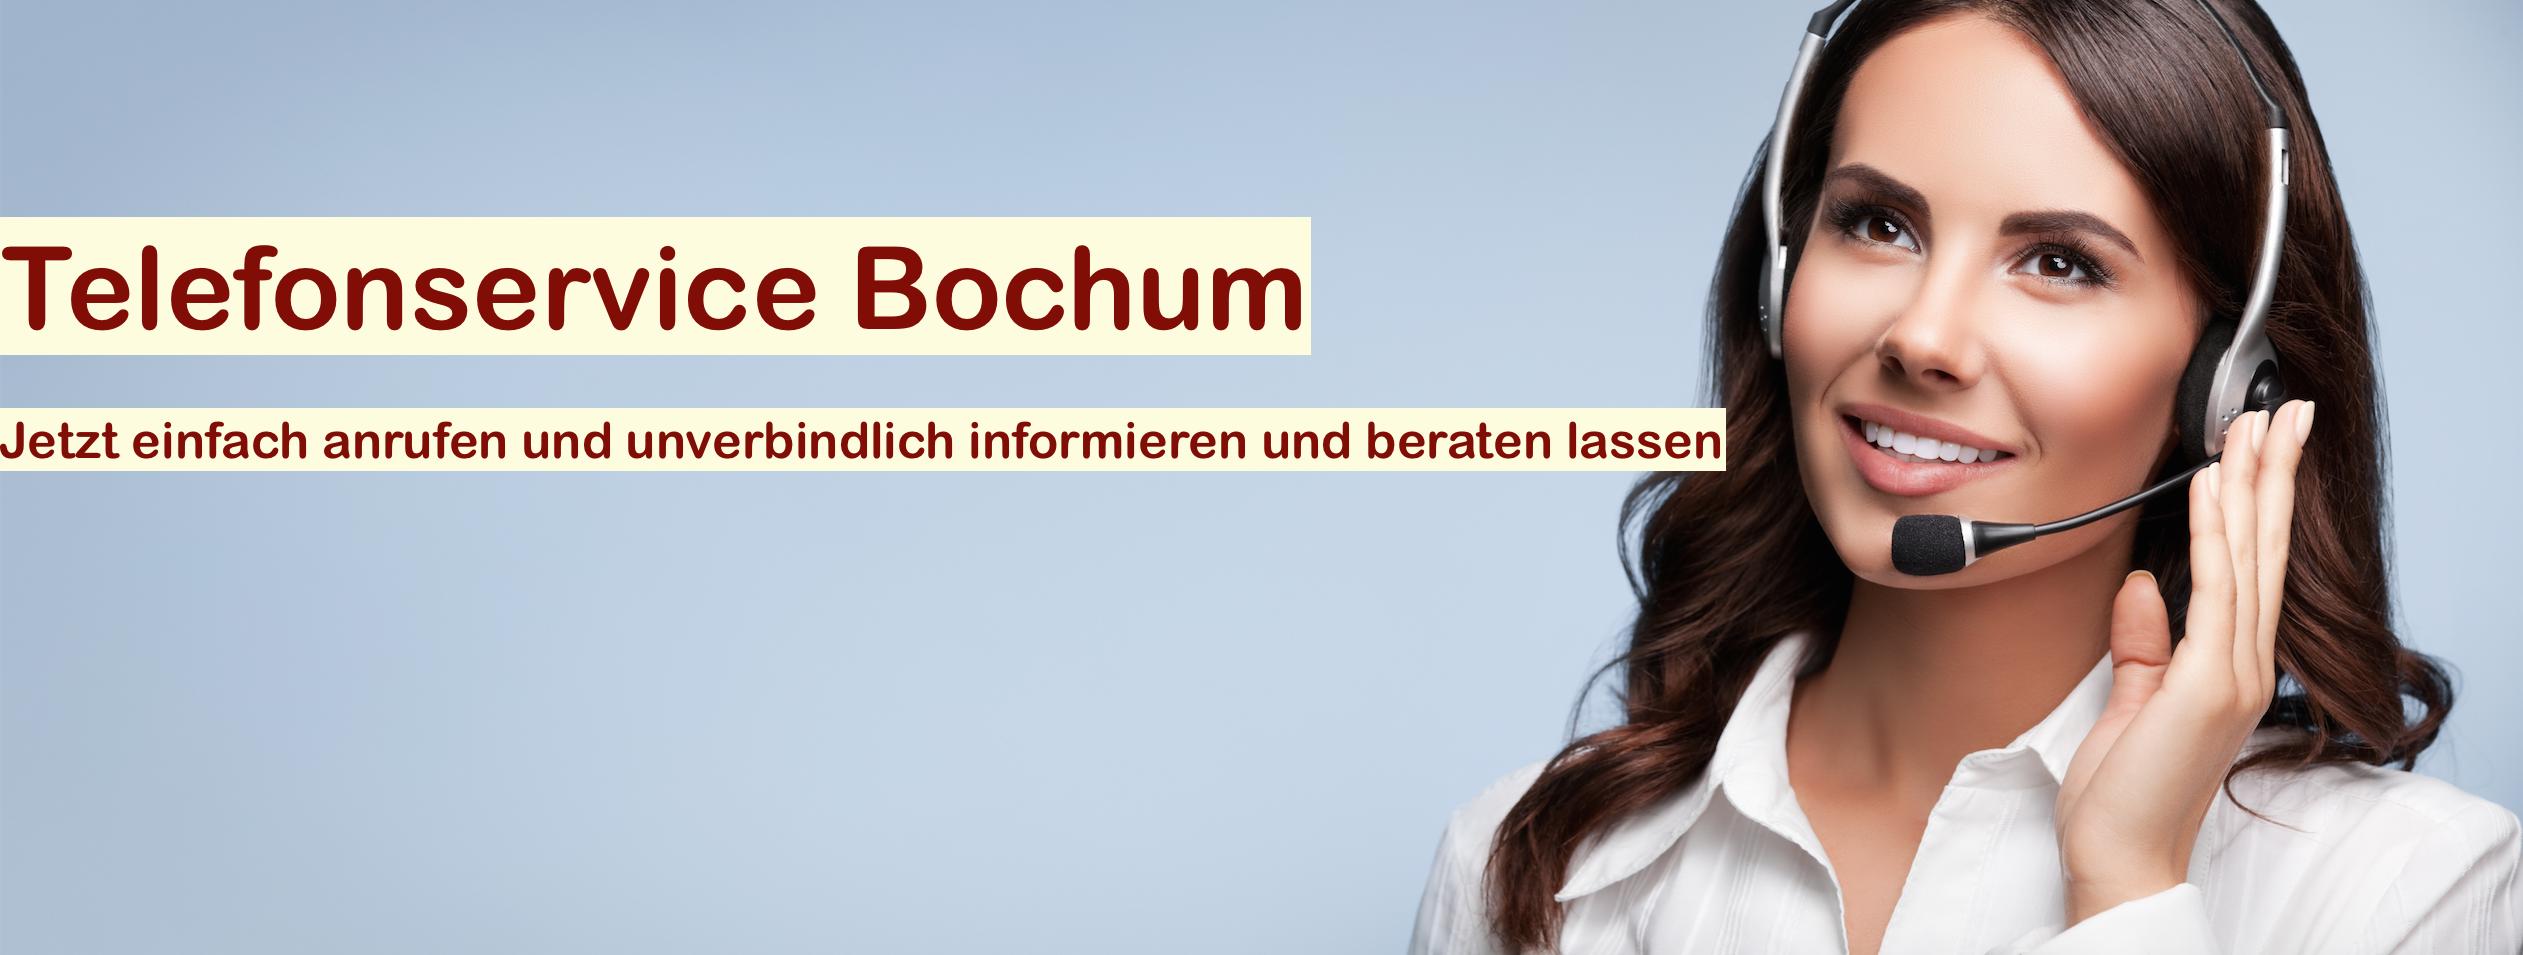 Telefonservice Bochum